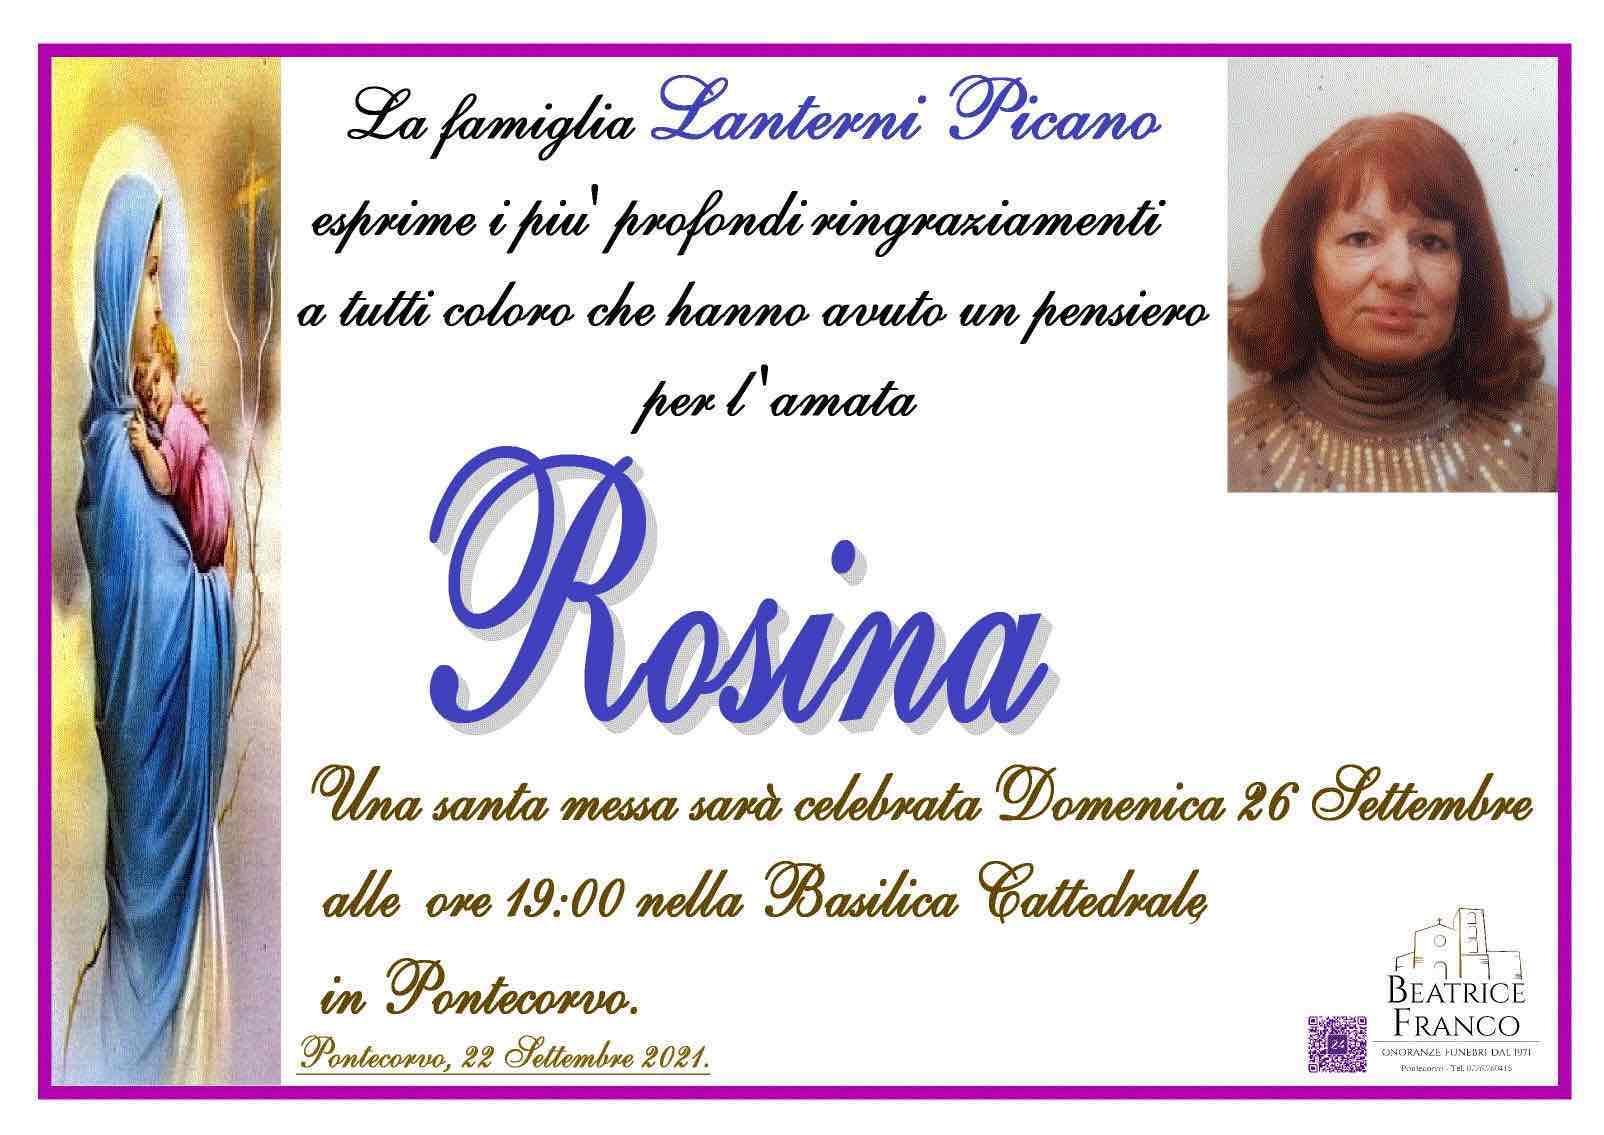 Rosina Picano